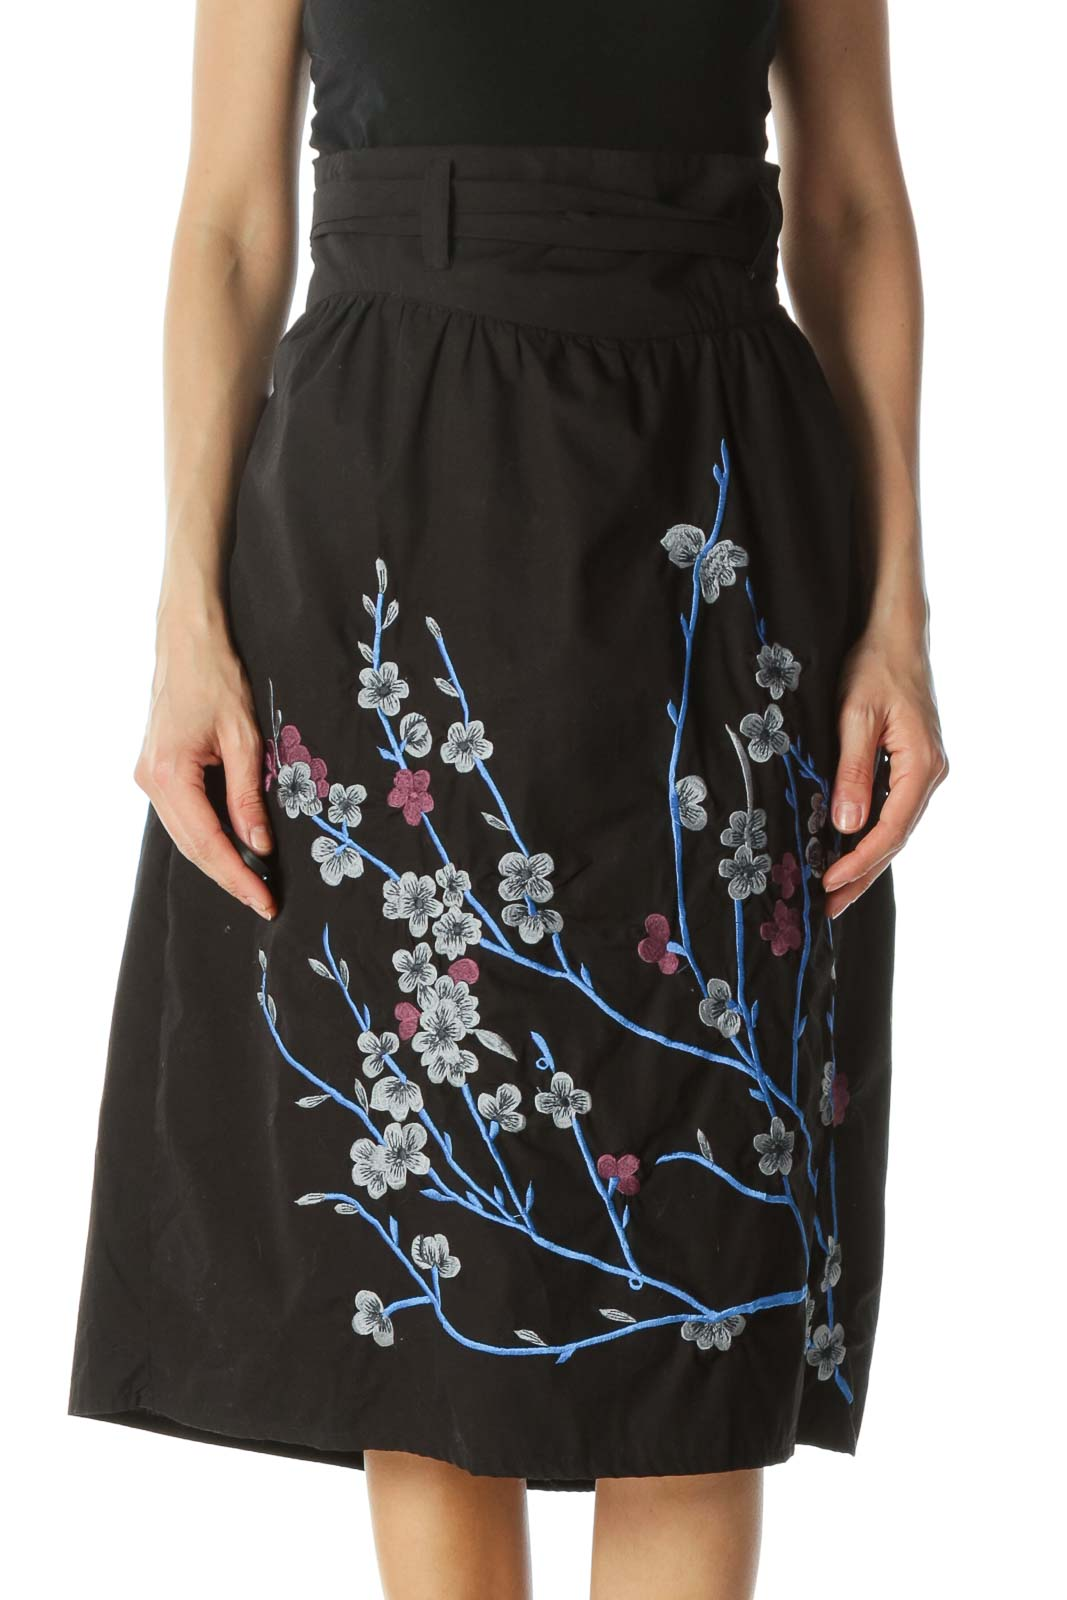 Black Floral-Embroidered Skirt Front